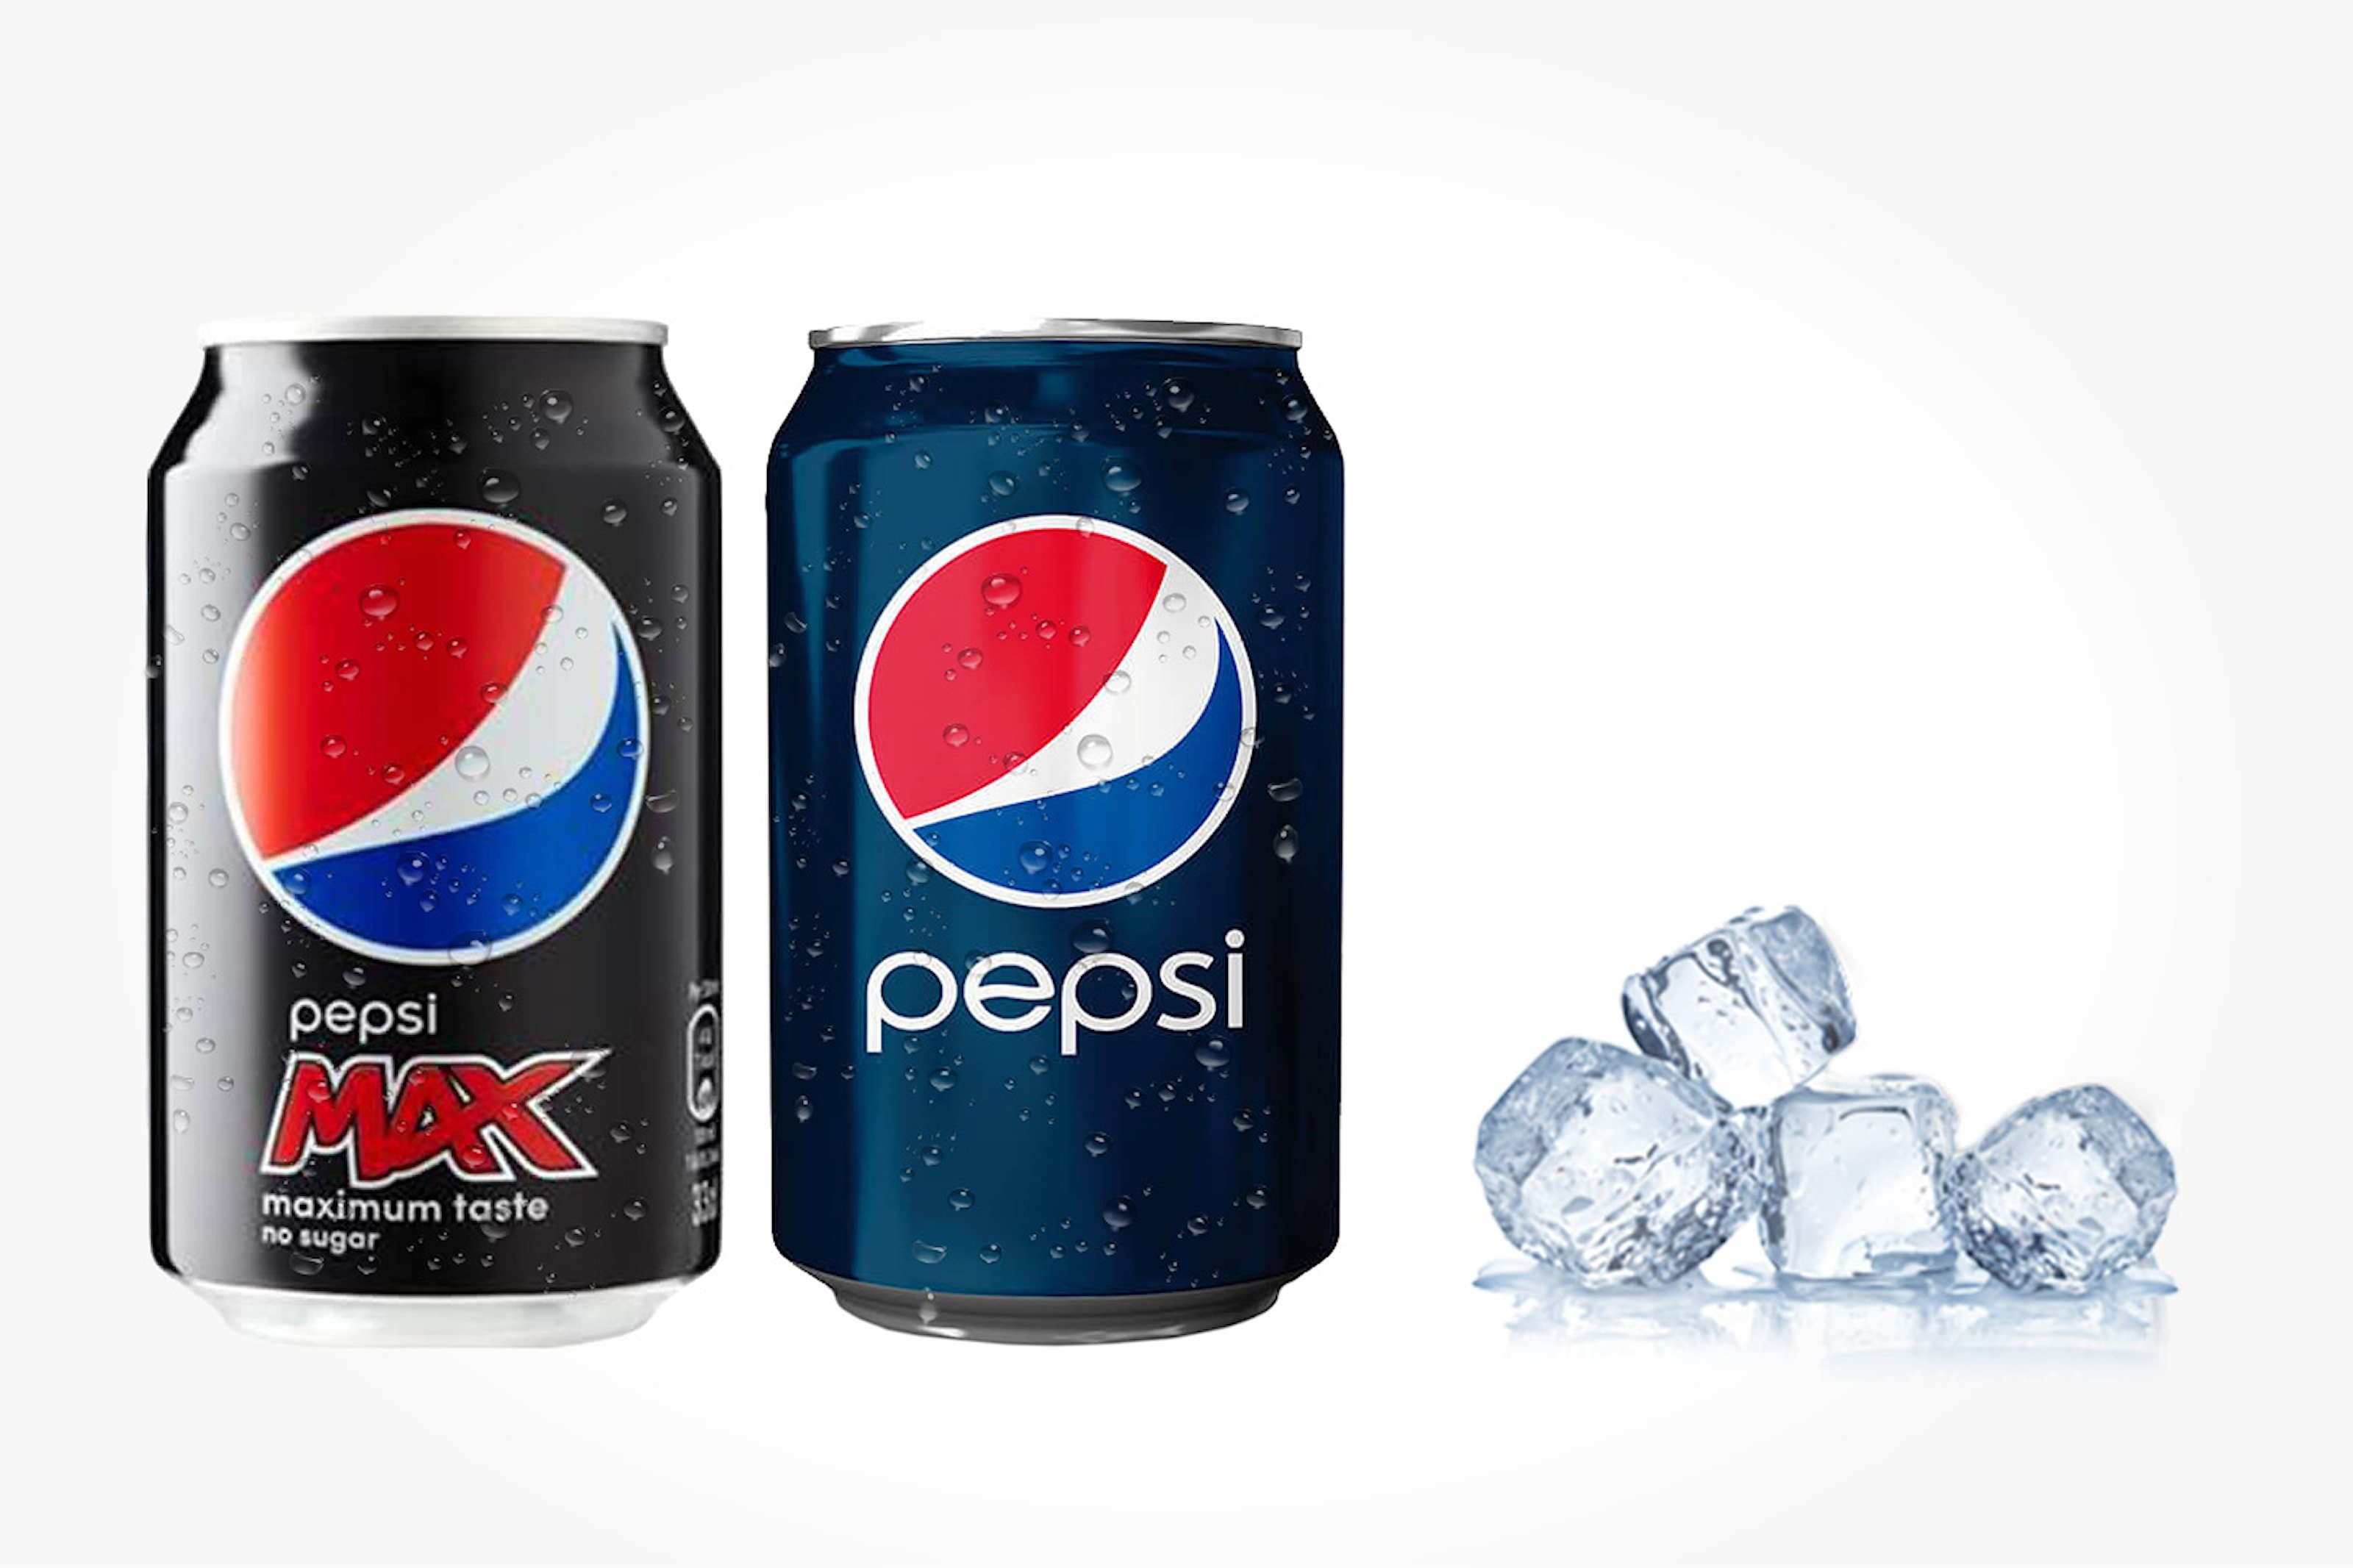 Tre brett med Pepsi eller Pepsi Max